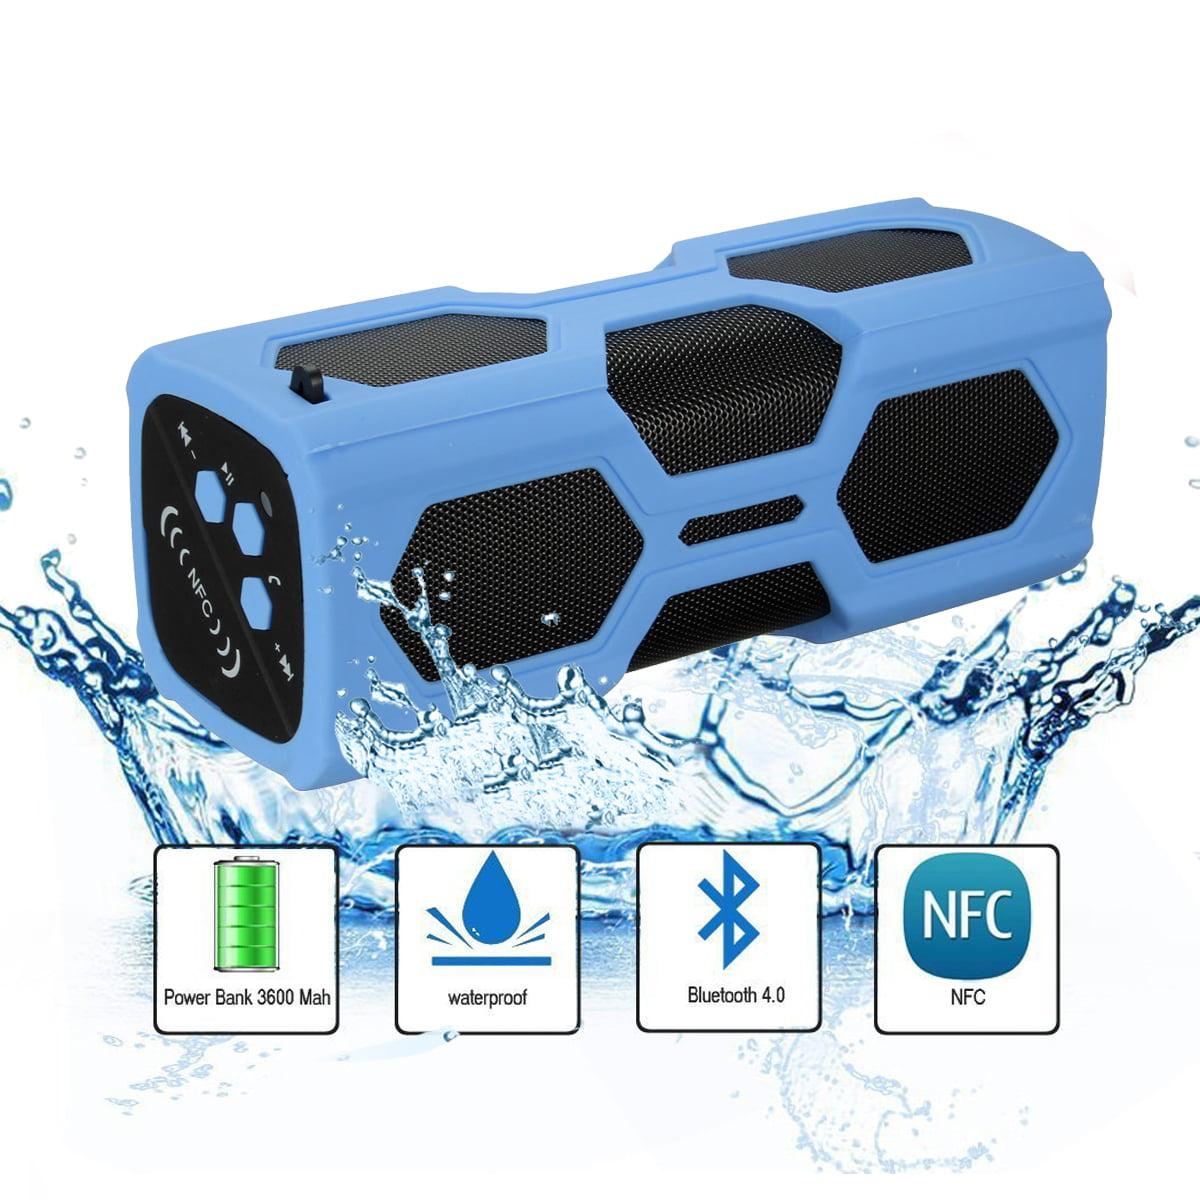 ELEGIANT Bluetooth Speaker - Rechargeable Power Bank - NFC Outdoor Wireless Waterproof SUPER BASS